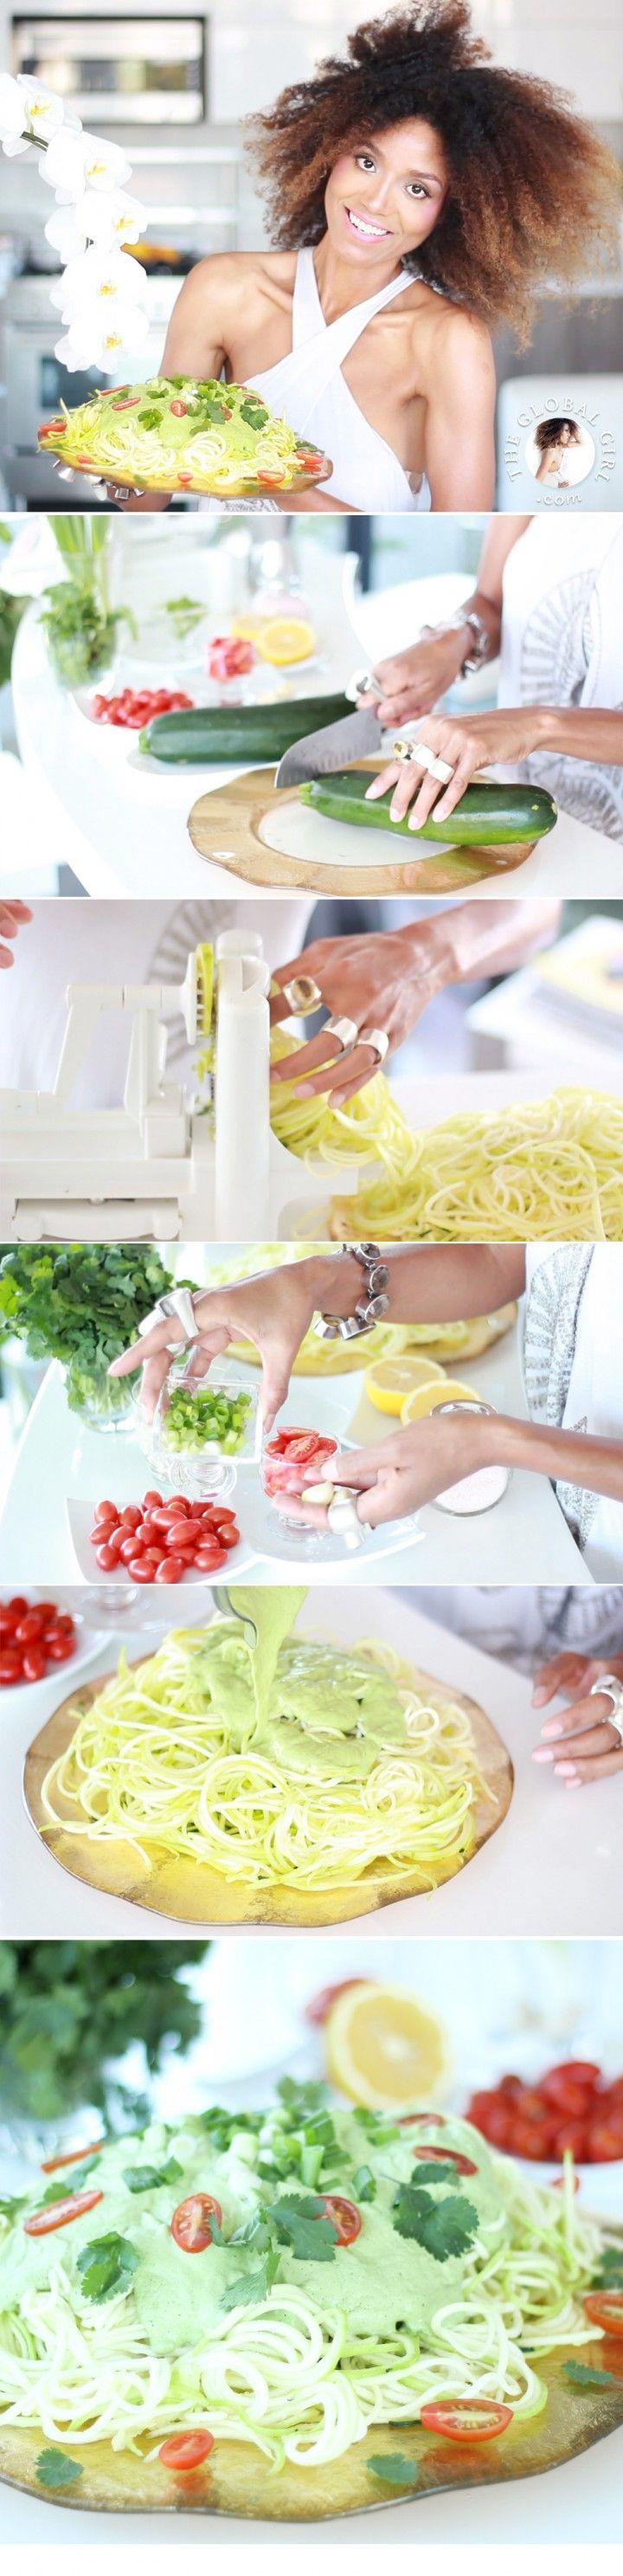 Raw zucchini pasta with creamy cashew cilantro sauce receta raw zucchini pasta with creamy cashew cilantro sauce receta recetas recetas veganas y comida forumfinder Gallery